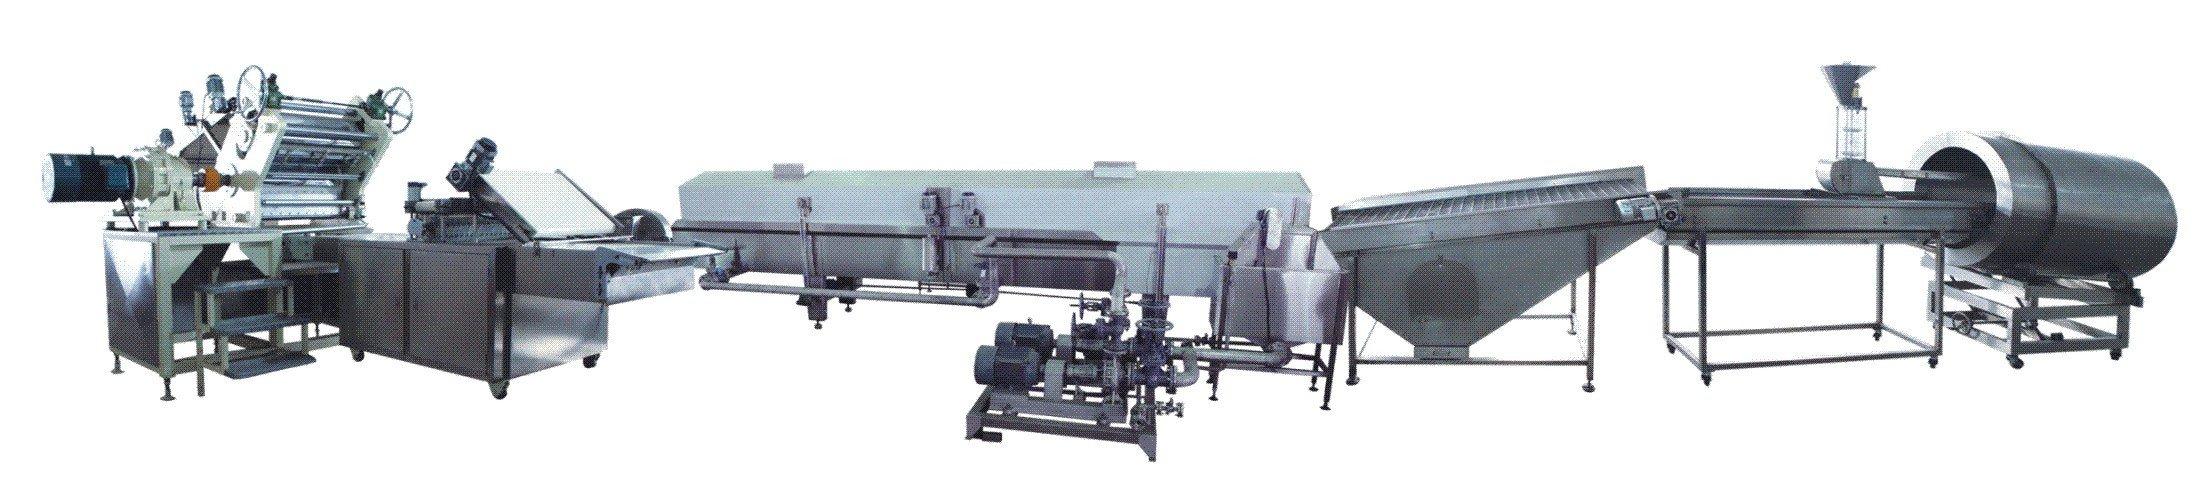 HANDYWARE potato corn tortilla maker machine manufacturer for trader-10